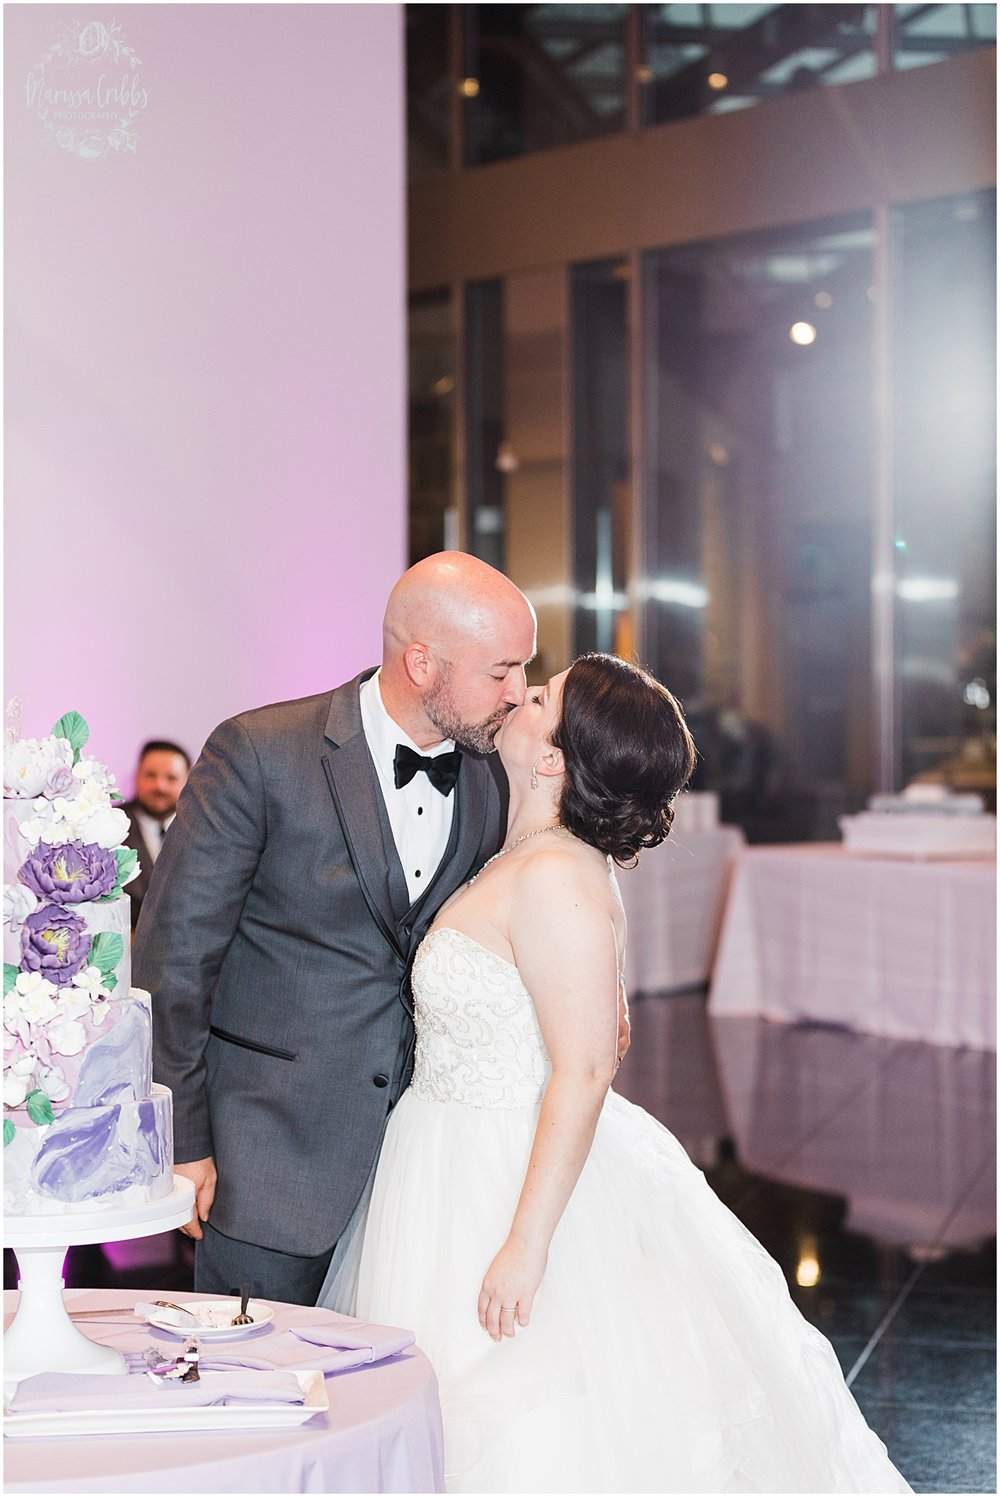 LAURA & DAN MARRIED   NELSON ATKINS MUSEUM   MARISSA CRIBBS PHOTOGRAPHY_7031.jpg